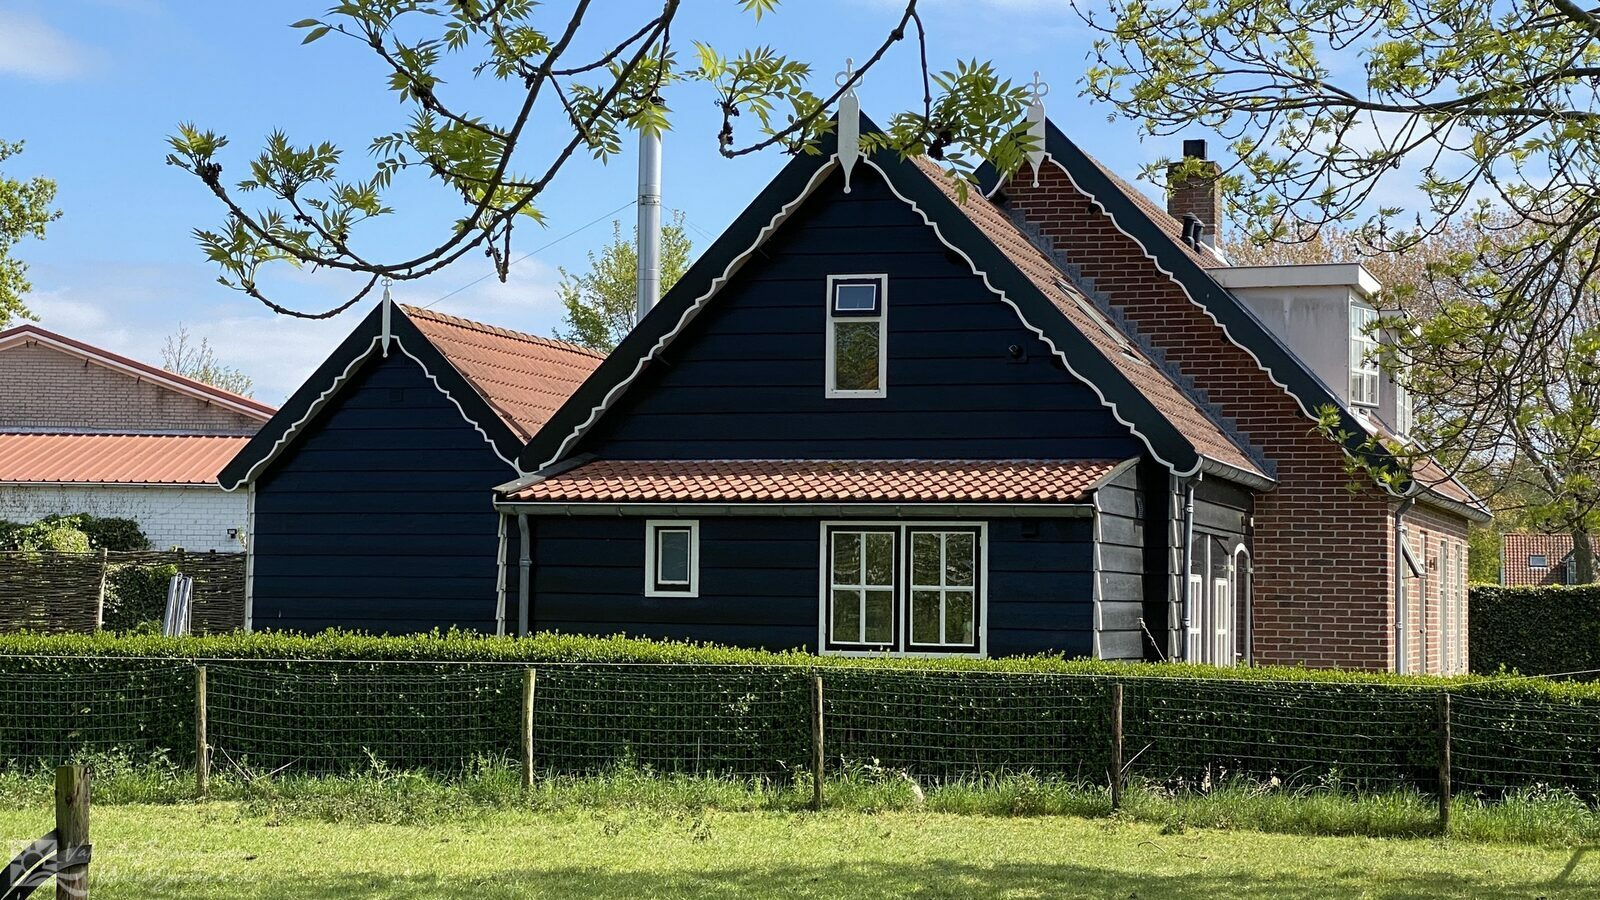 VZ409 Ferienhaus in Oostkapelle